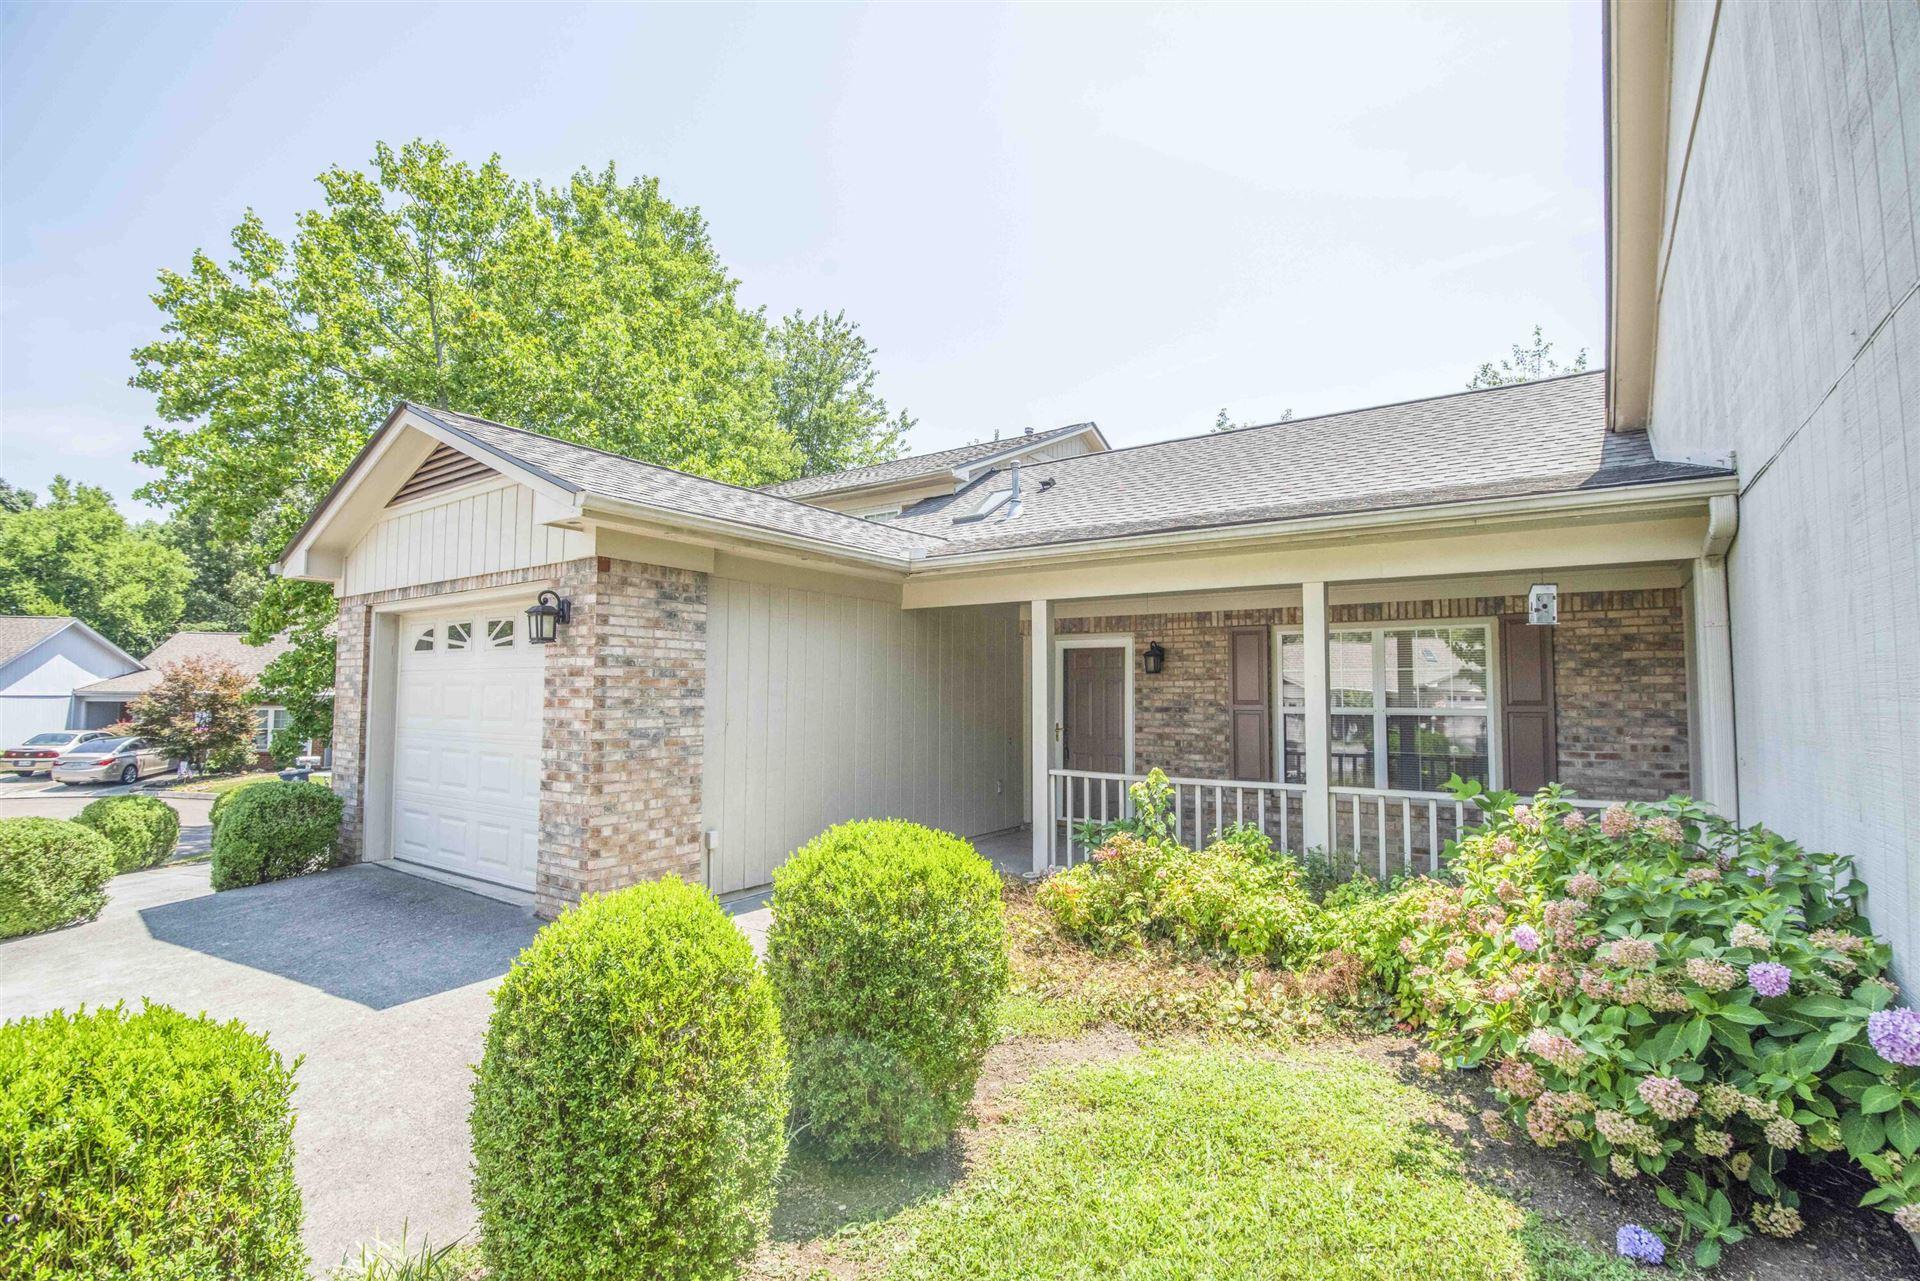 Photo of 5258 Brig Lane, Knoxville, TN 37914 (MLS # 1162191)